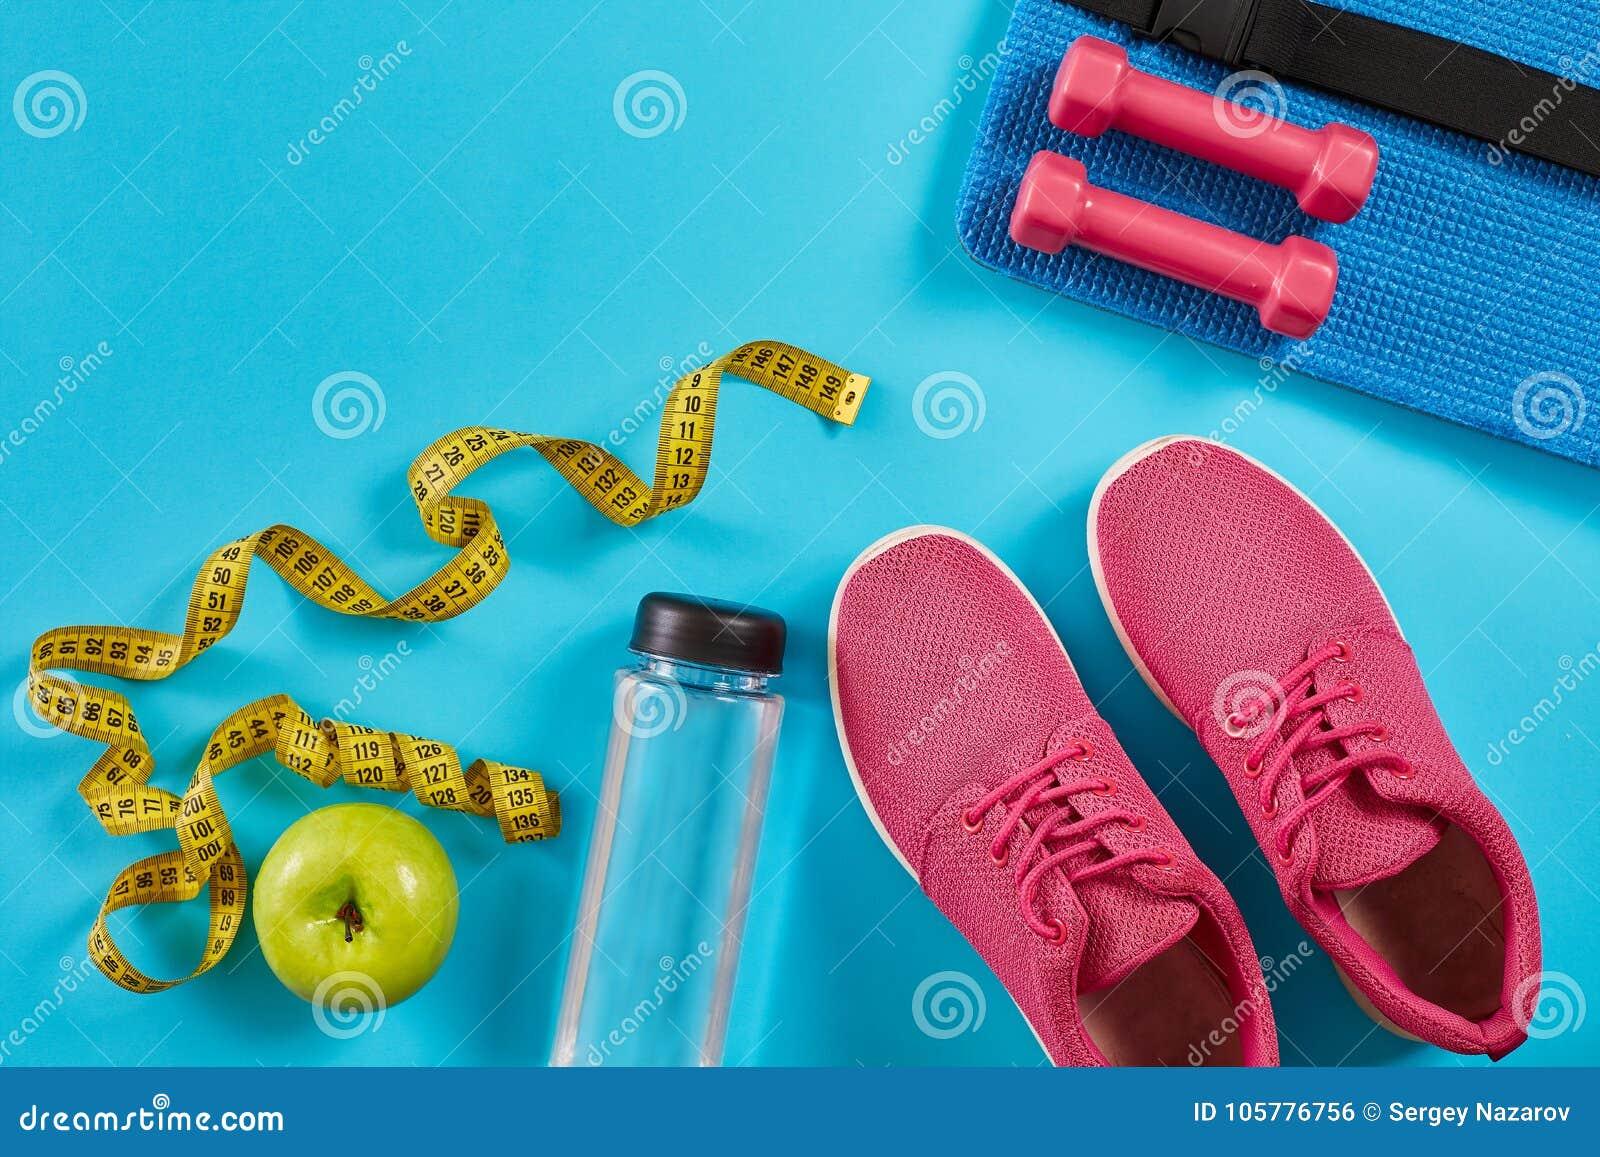 8e5705b05d3 Πάνινα παπούτσια με τη μέτρηση της ταινίας στο κυανό μπλε υπόβαθρο  Εκατοστόμετρο στο κίτρινο χρώμα,